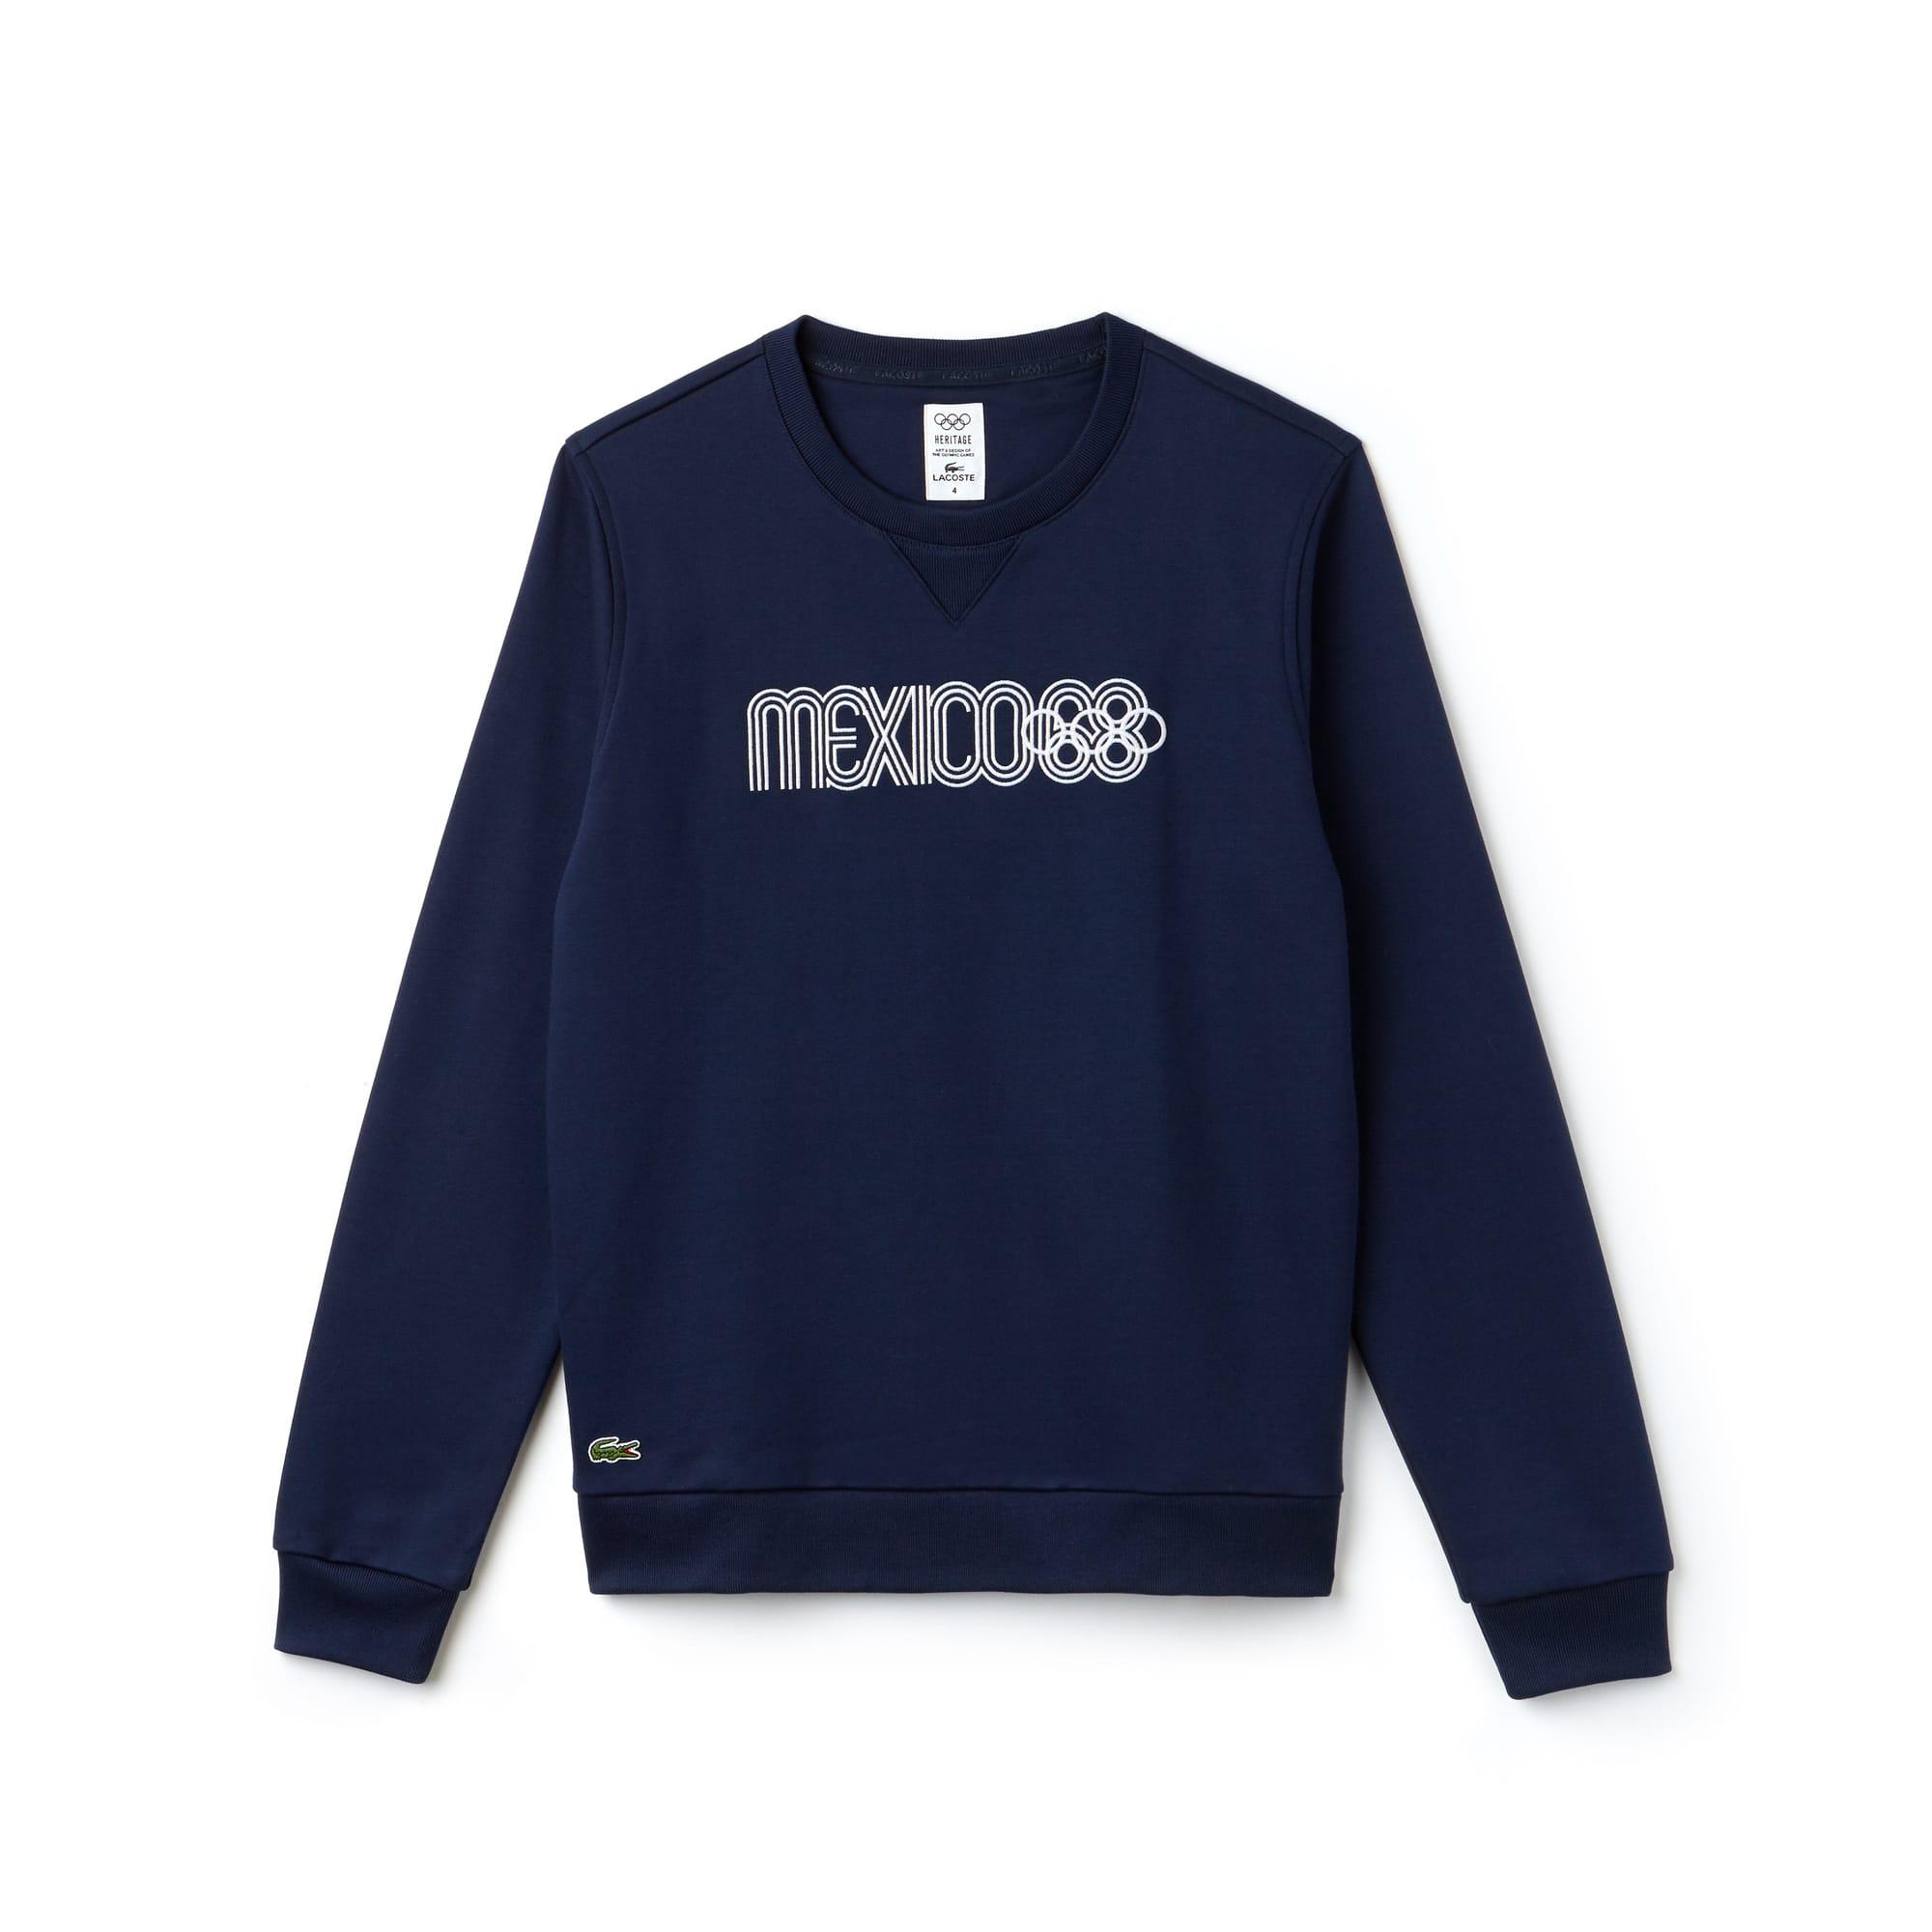 Lacoste SPORT系列奥运会纪念版男士刺绣拉绒运动衫